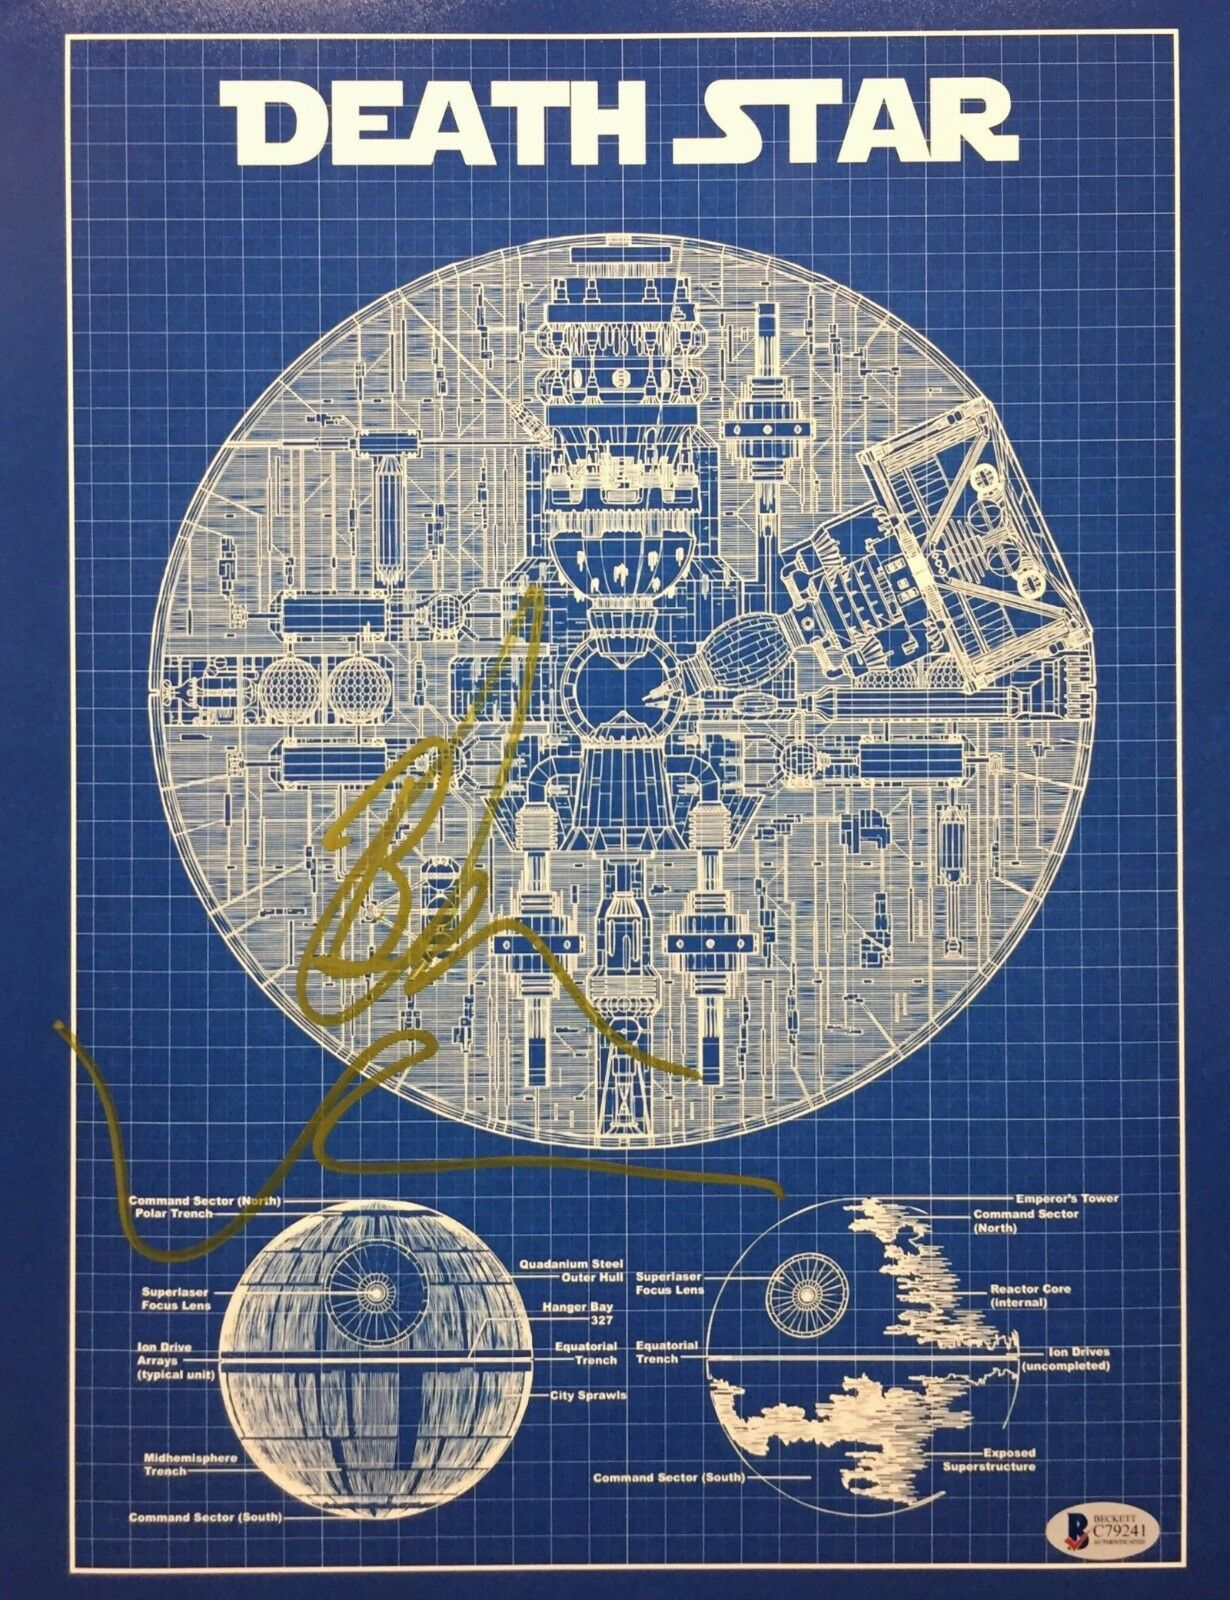 Ben Mendelsohn Signed Star Wars *Rogue One 11x14 Photo *Death Star BAS C79241